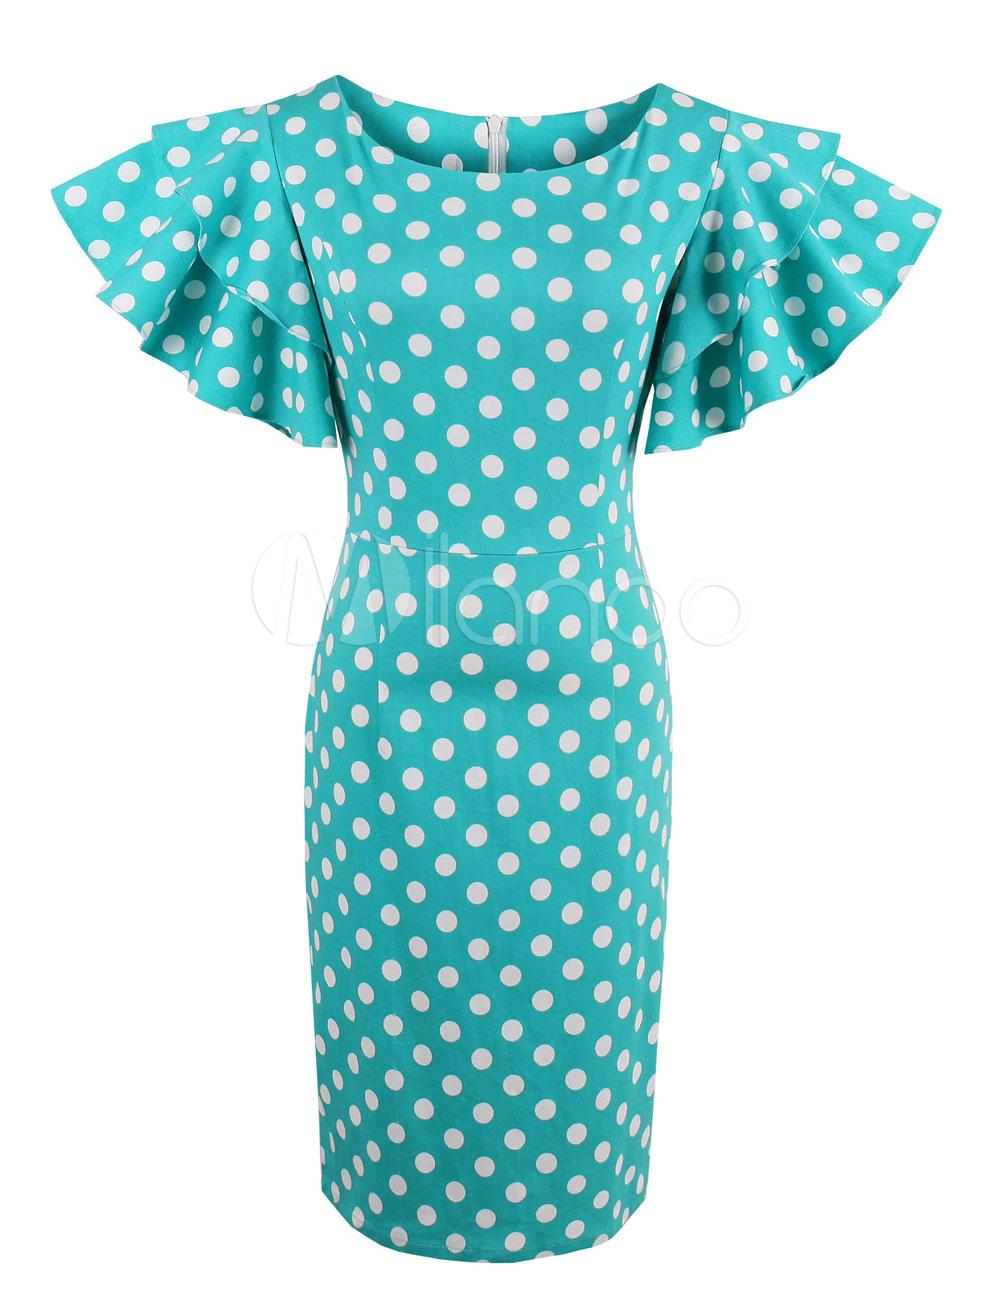 Women's Vintage Dress Polka Dot Round Neck Short Sleeve Ruffles Blue Green Sheath Dress (Women\\'s Clothing Vintage Dresses) photo